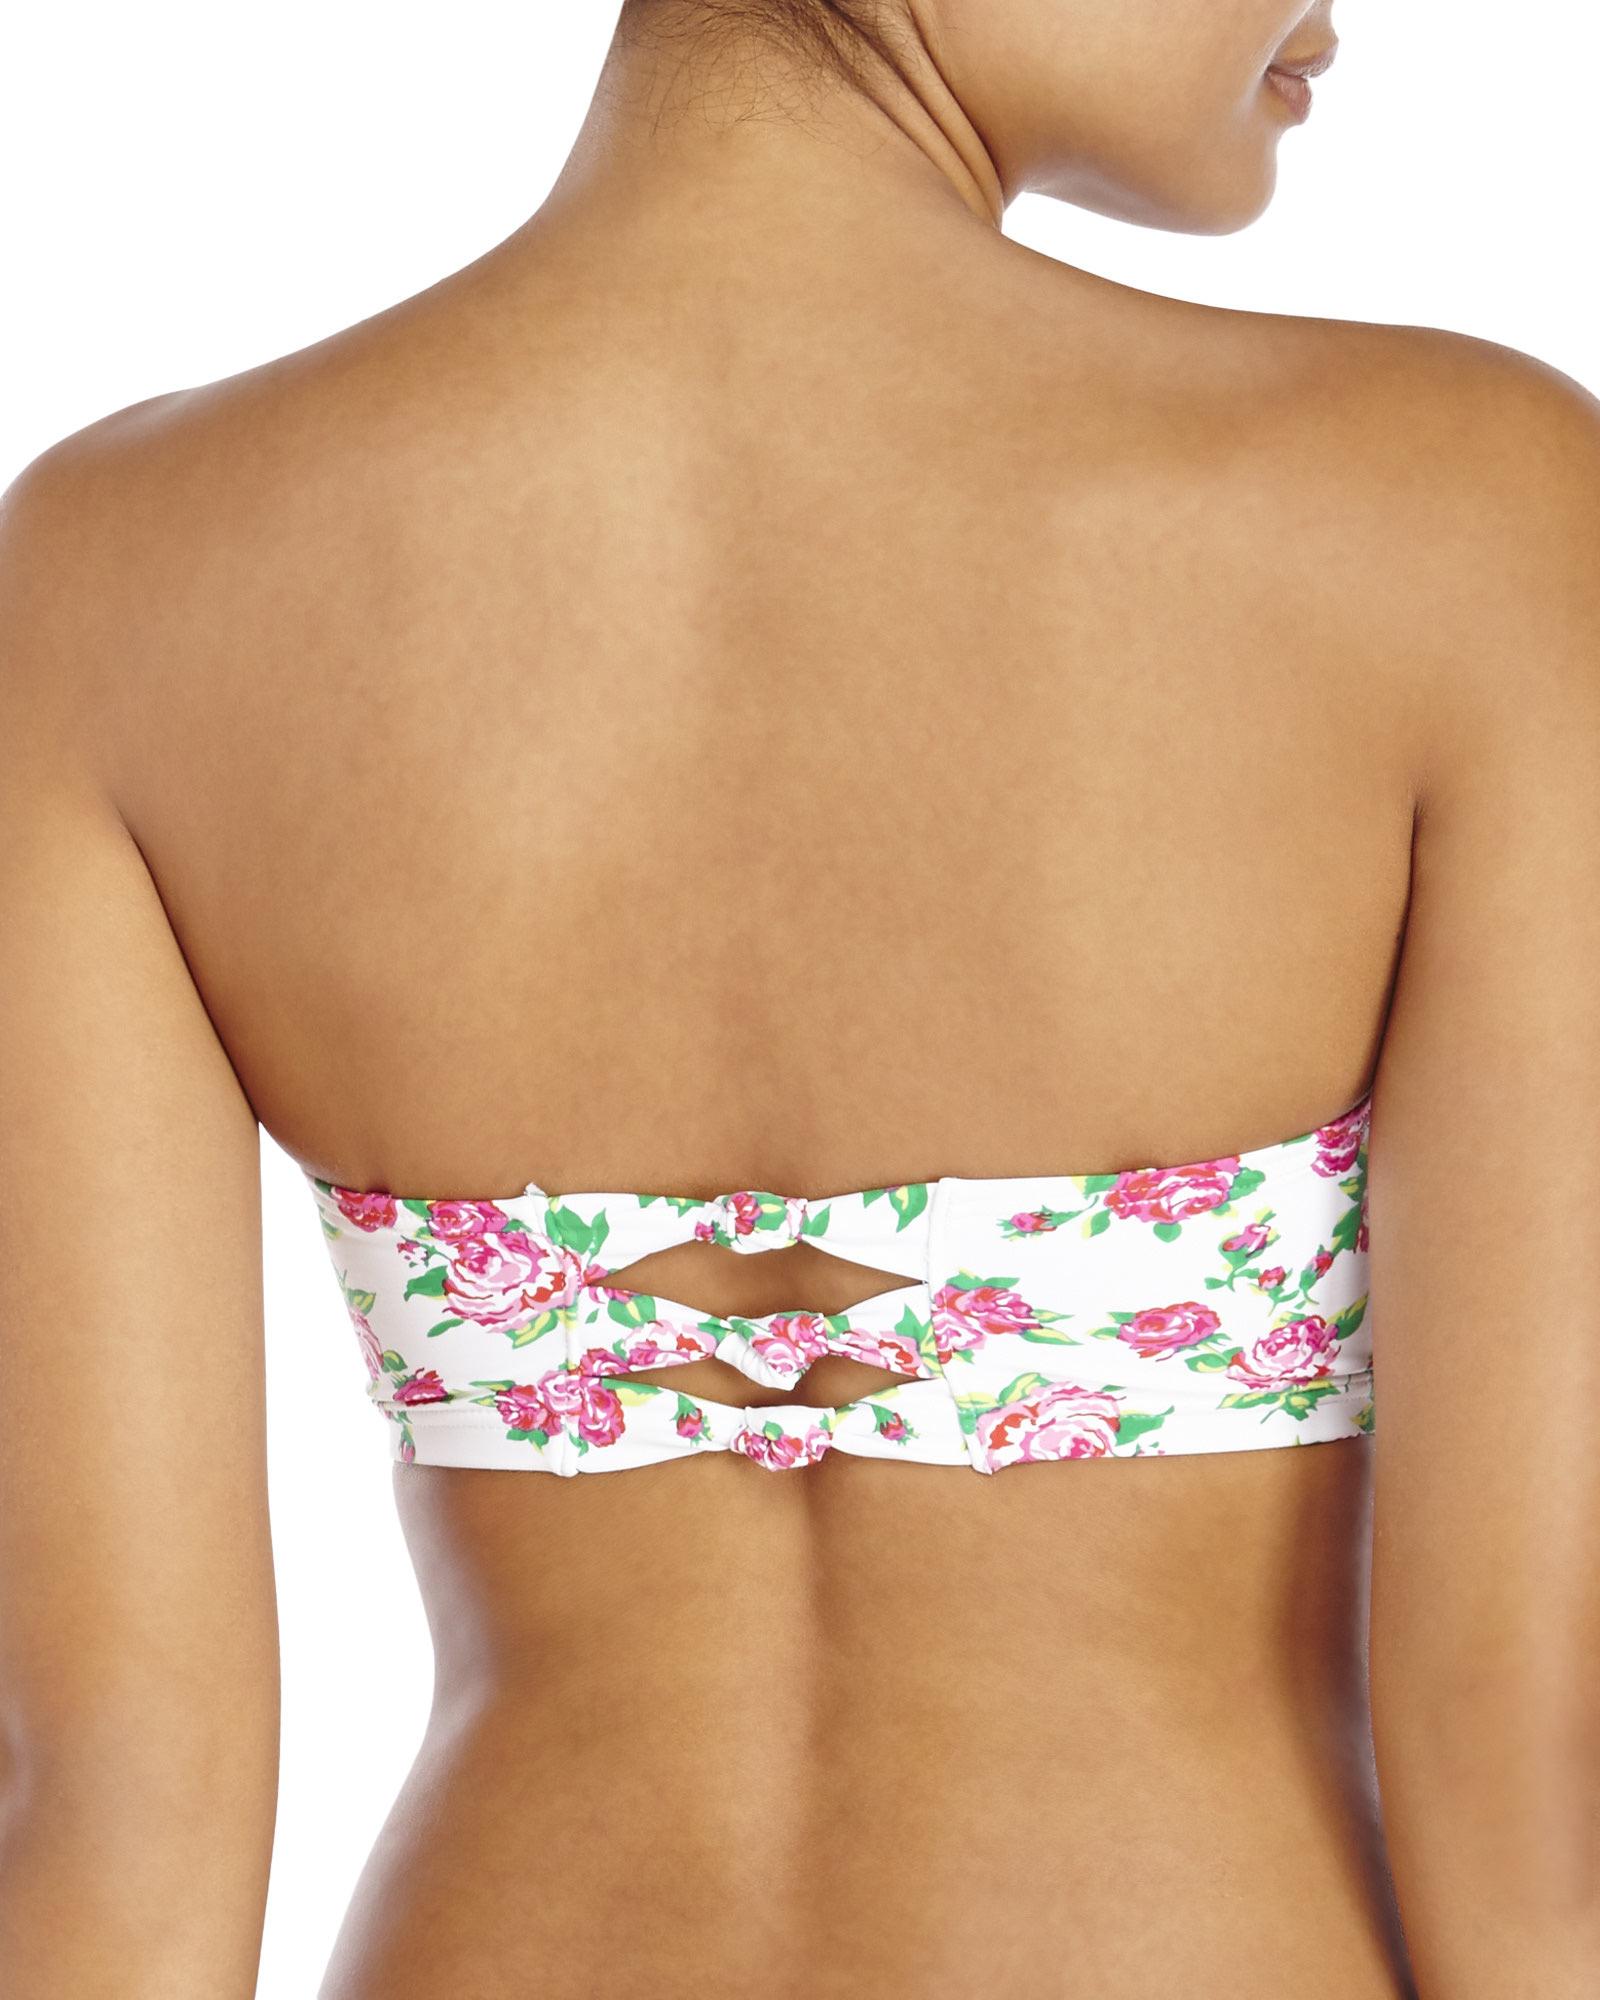 betsey johnson rose bikini